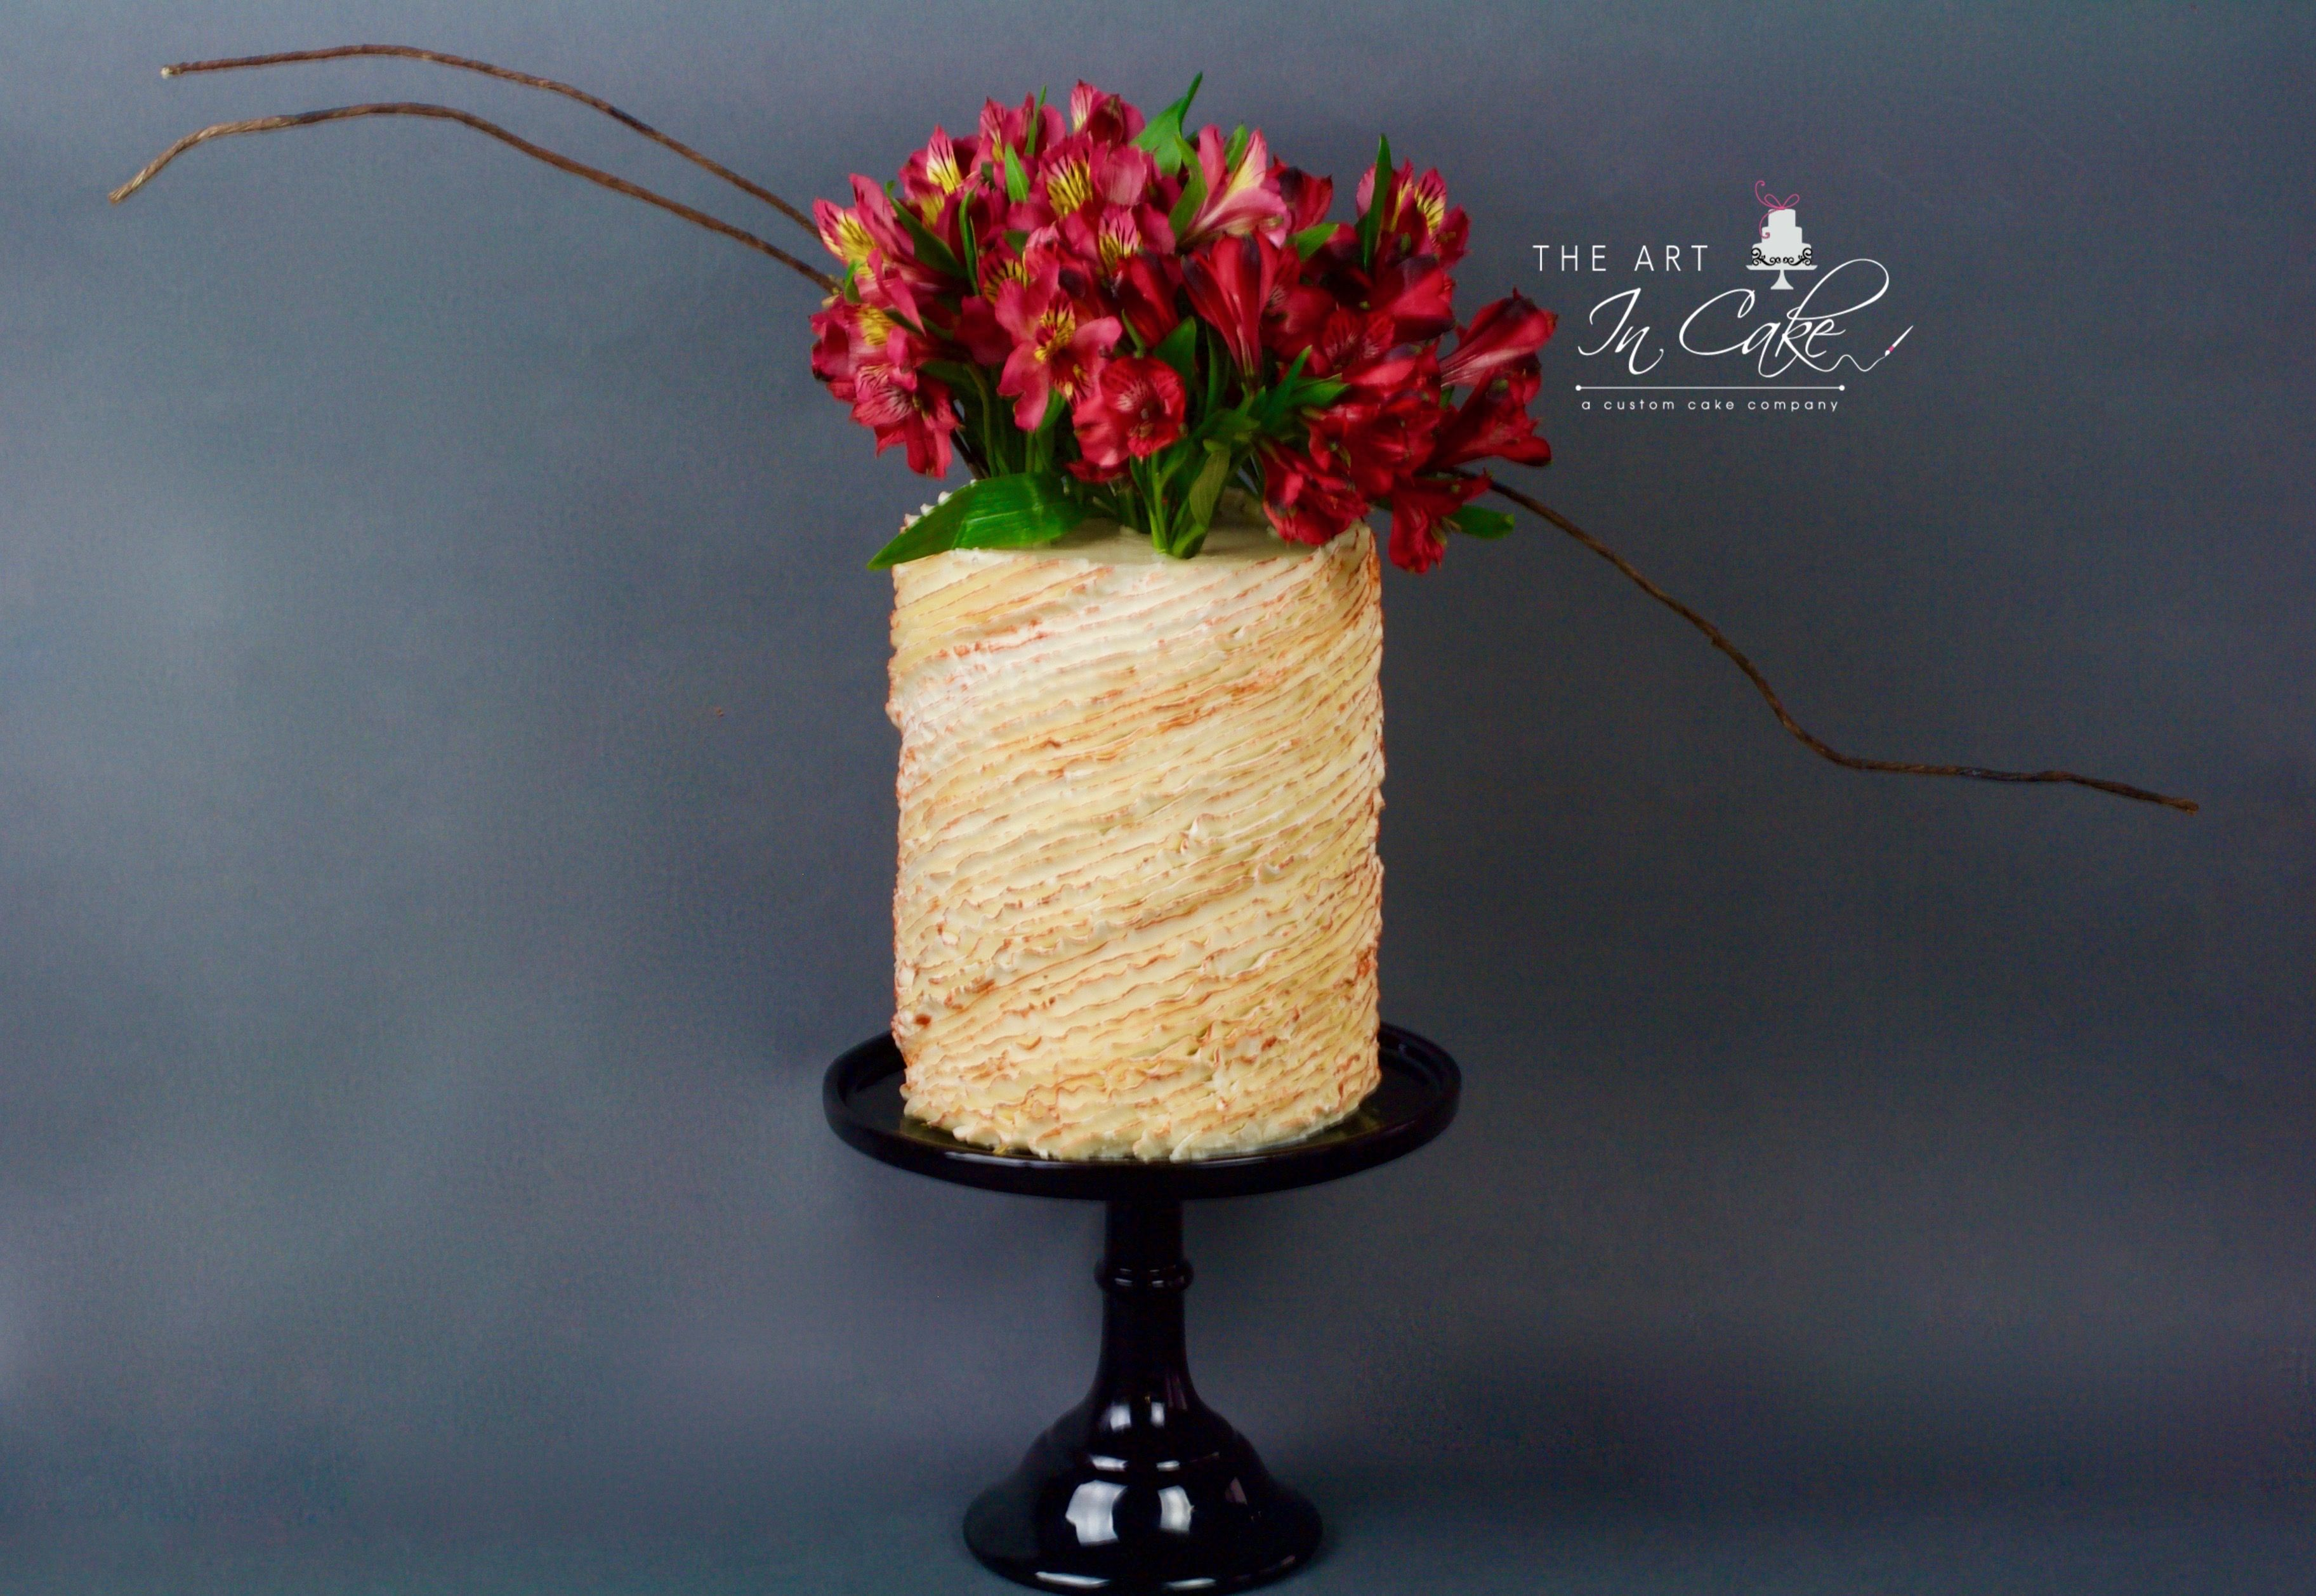 My wrap around diagonal ruffle cake painted with metallic